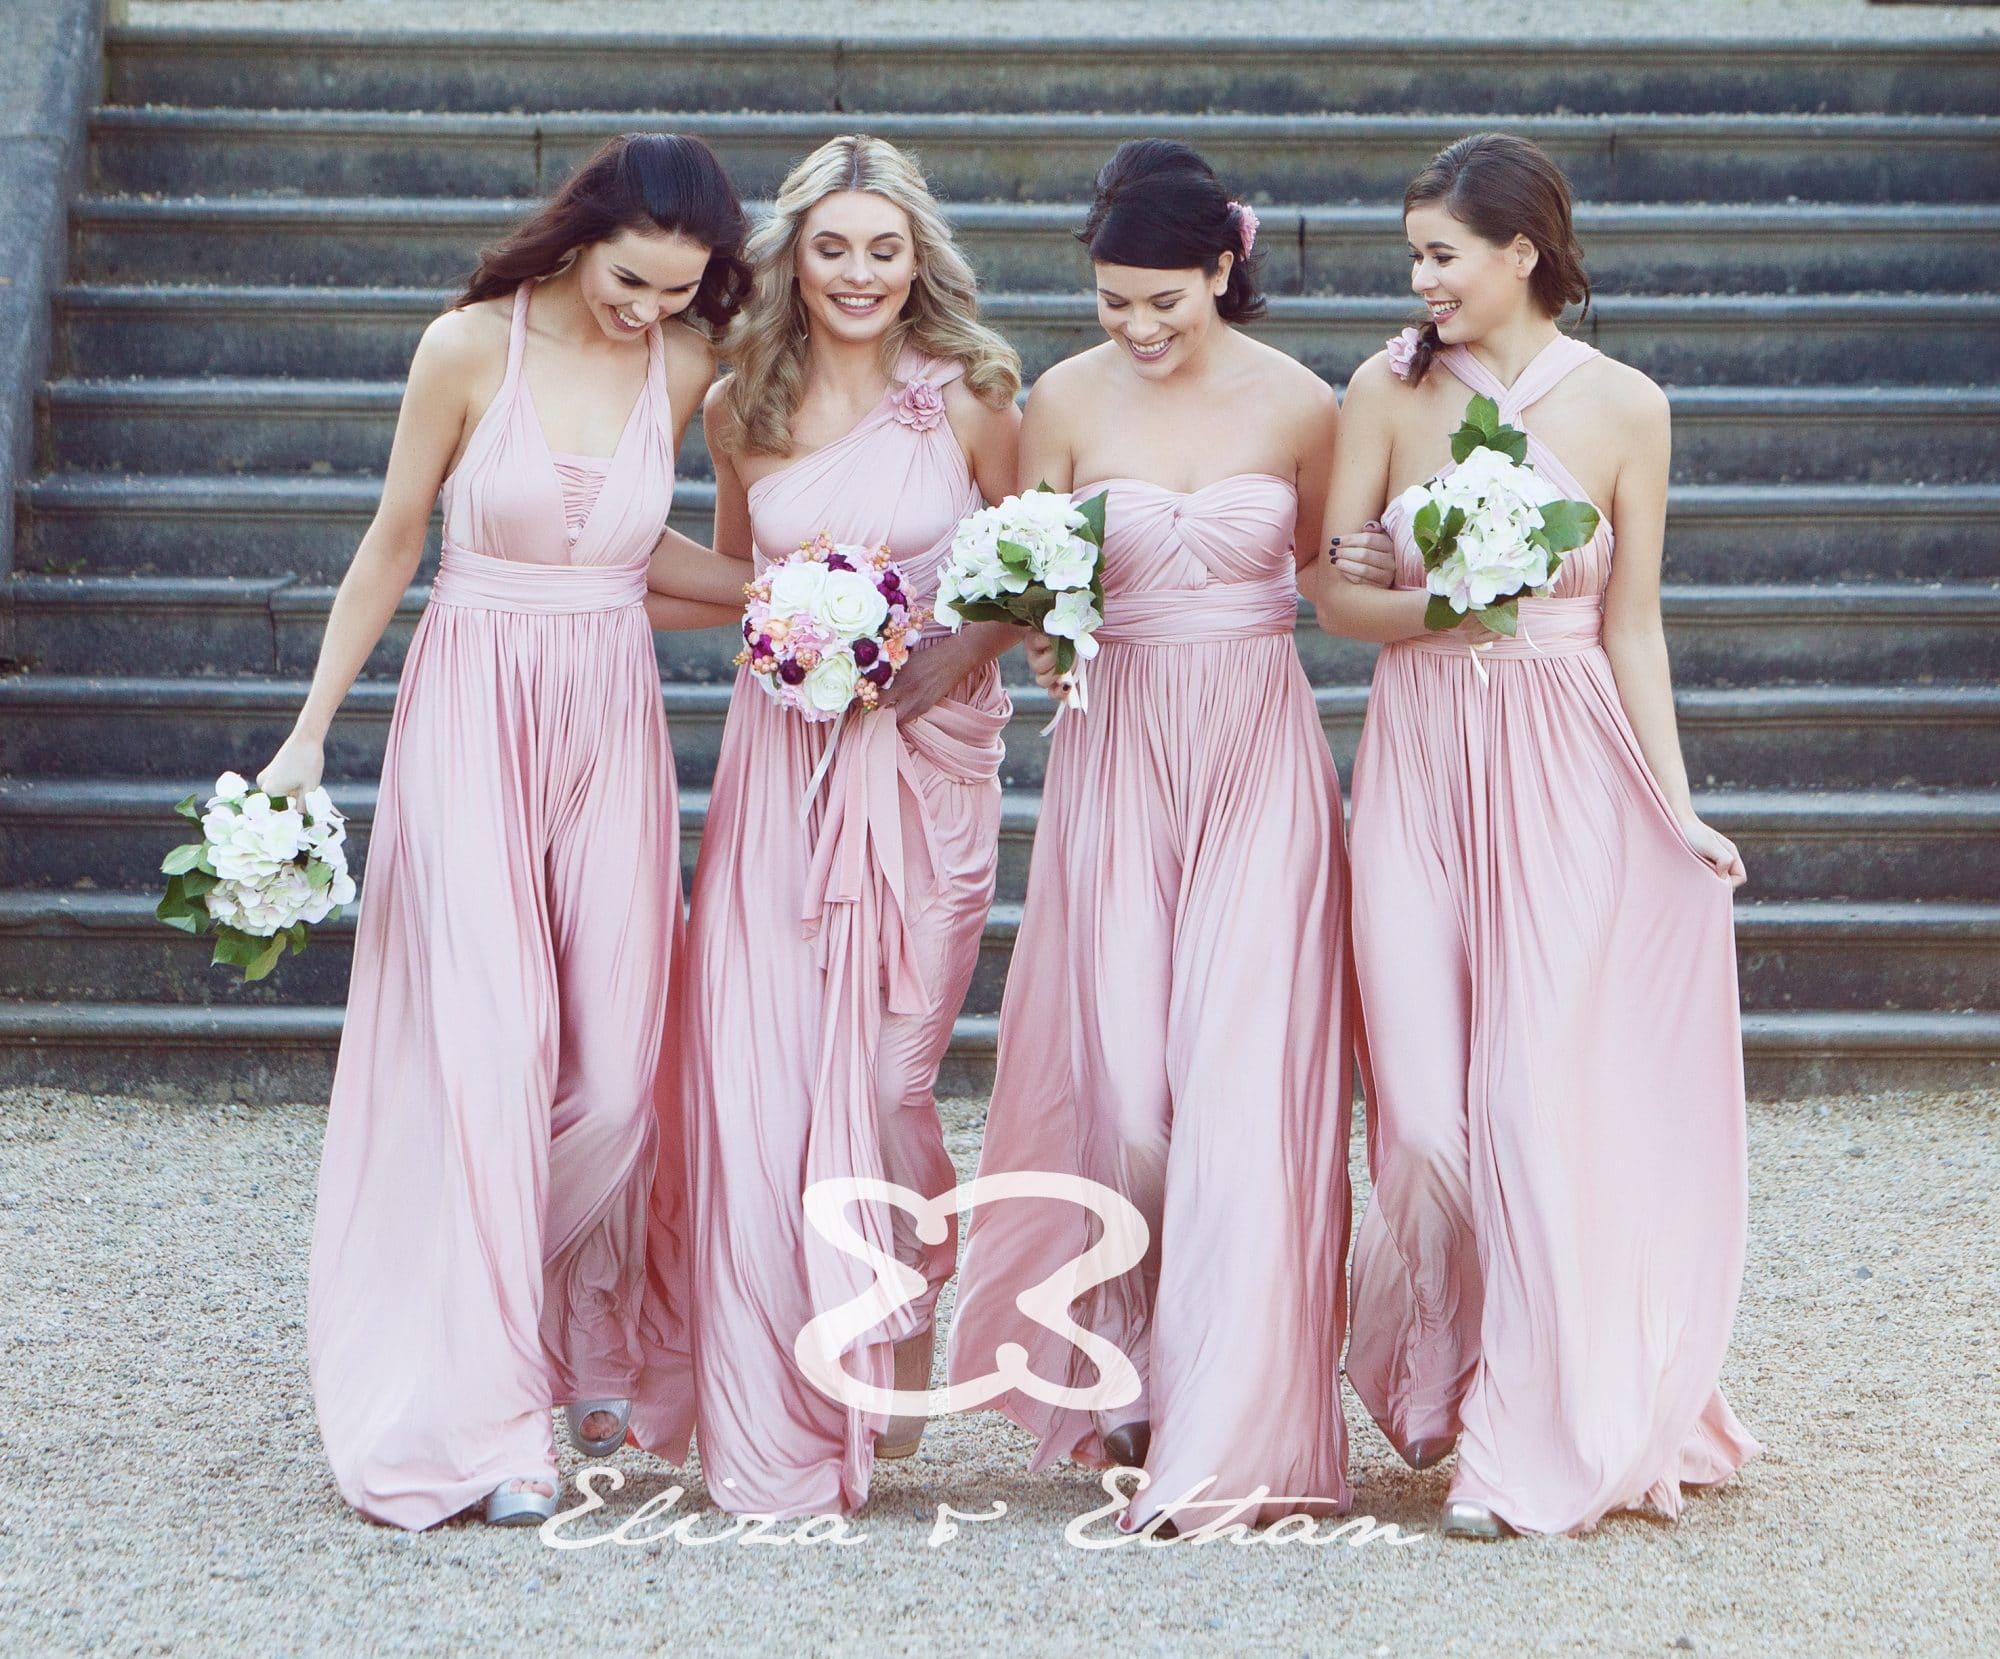 Eliza ethan multi wrap dress gallery bridesmaids gallery 08022015elizaethan35x1 eliza ethan multiway dress 08022015elizaethan26x0x1100x700logo ombrellifo Images